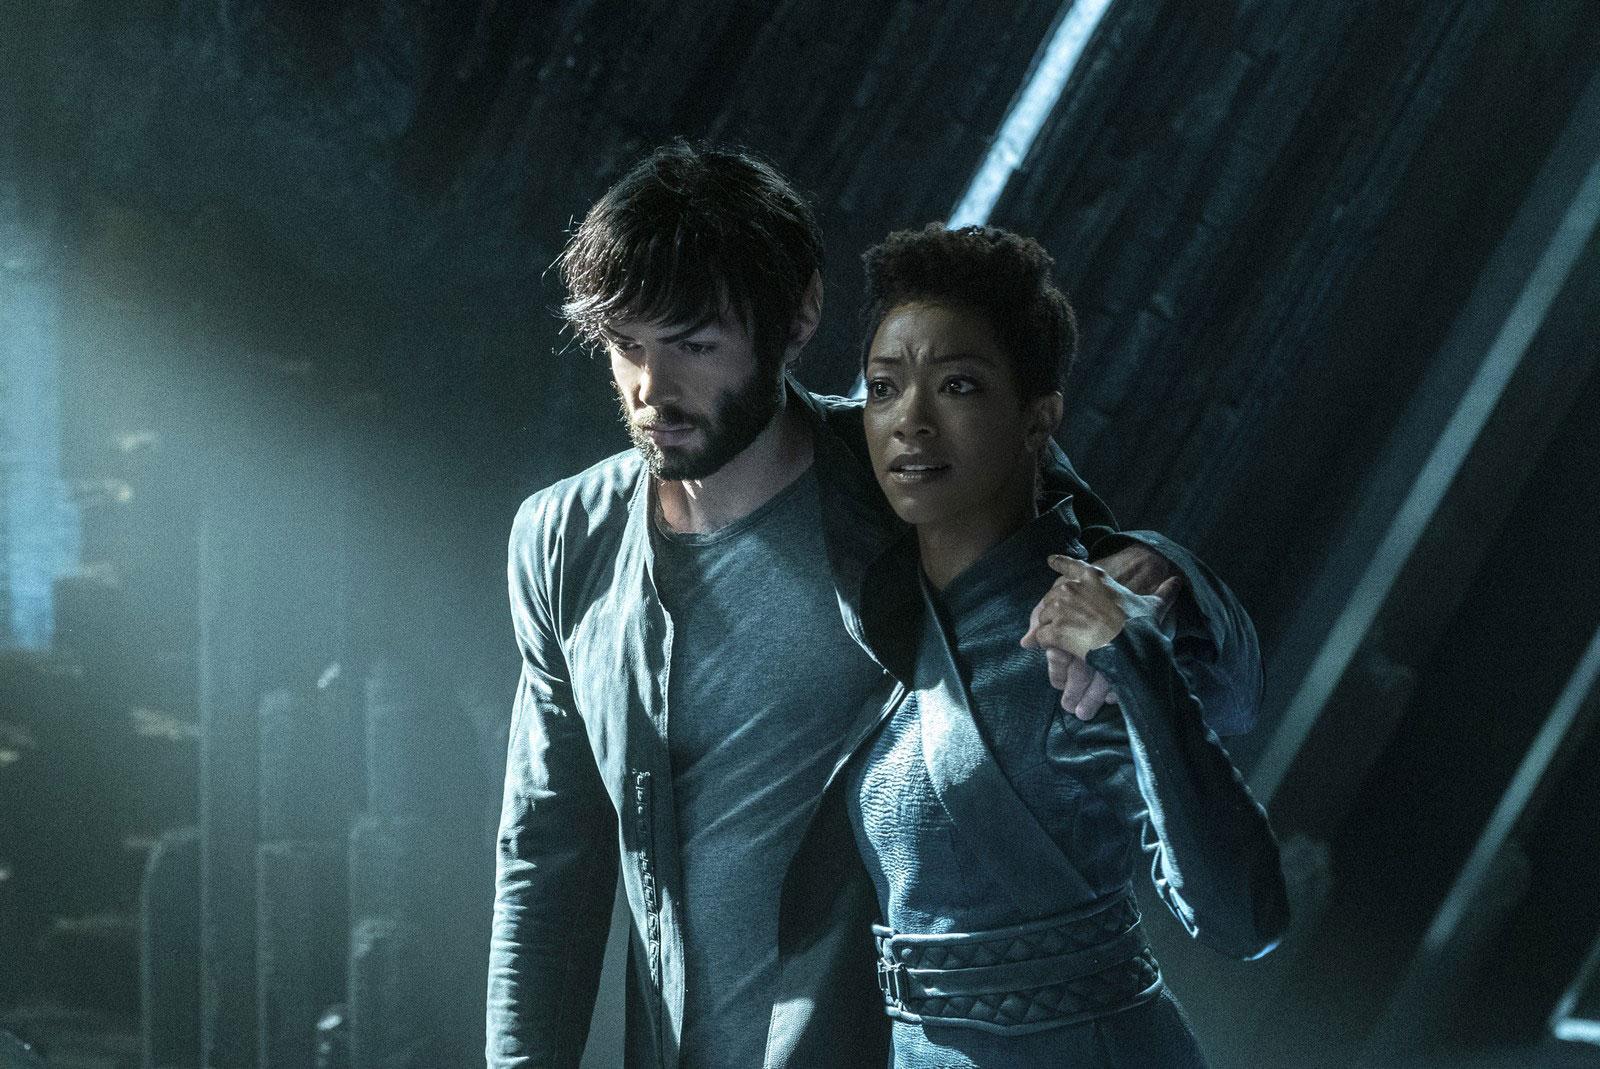 Ethan Peck as Spock and Sonequa Martin-Green as Michael Burnham